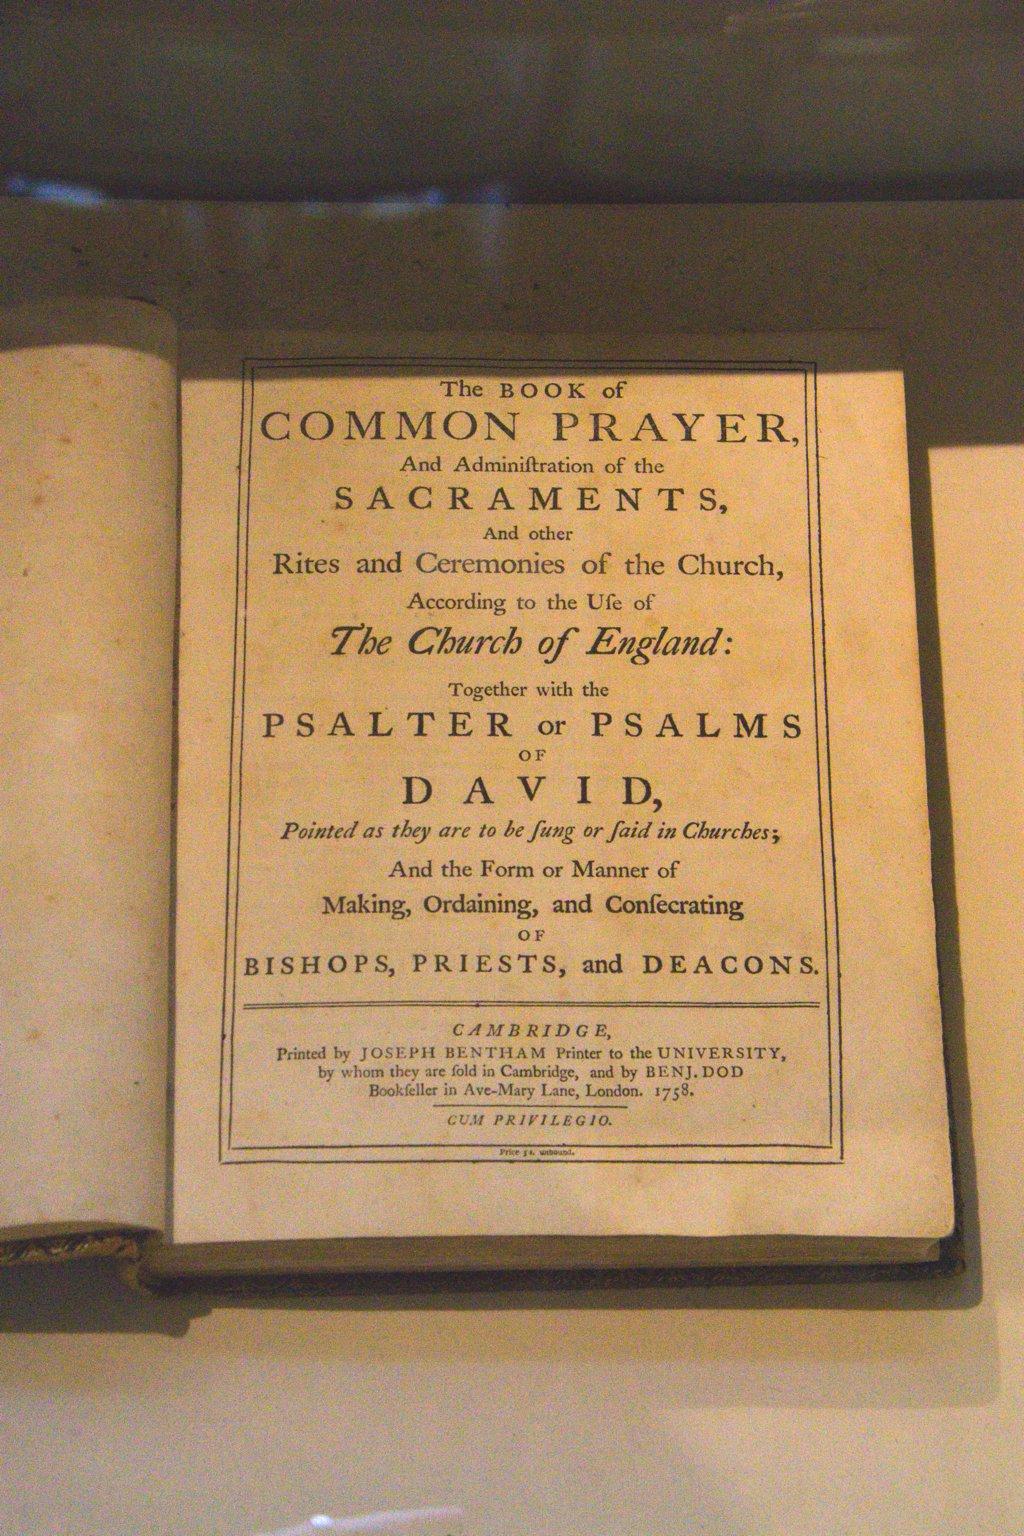 Cambridge Book of Common Prayer